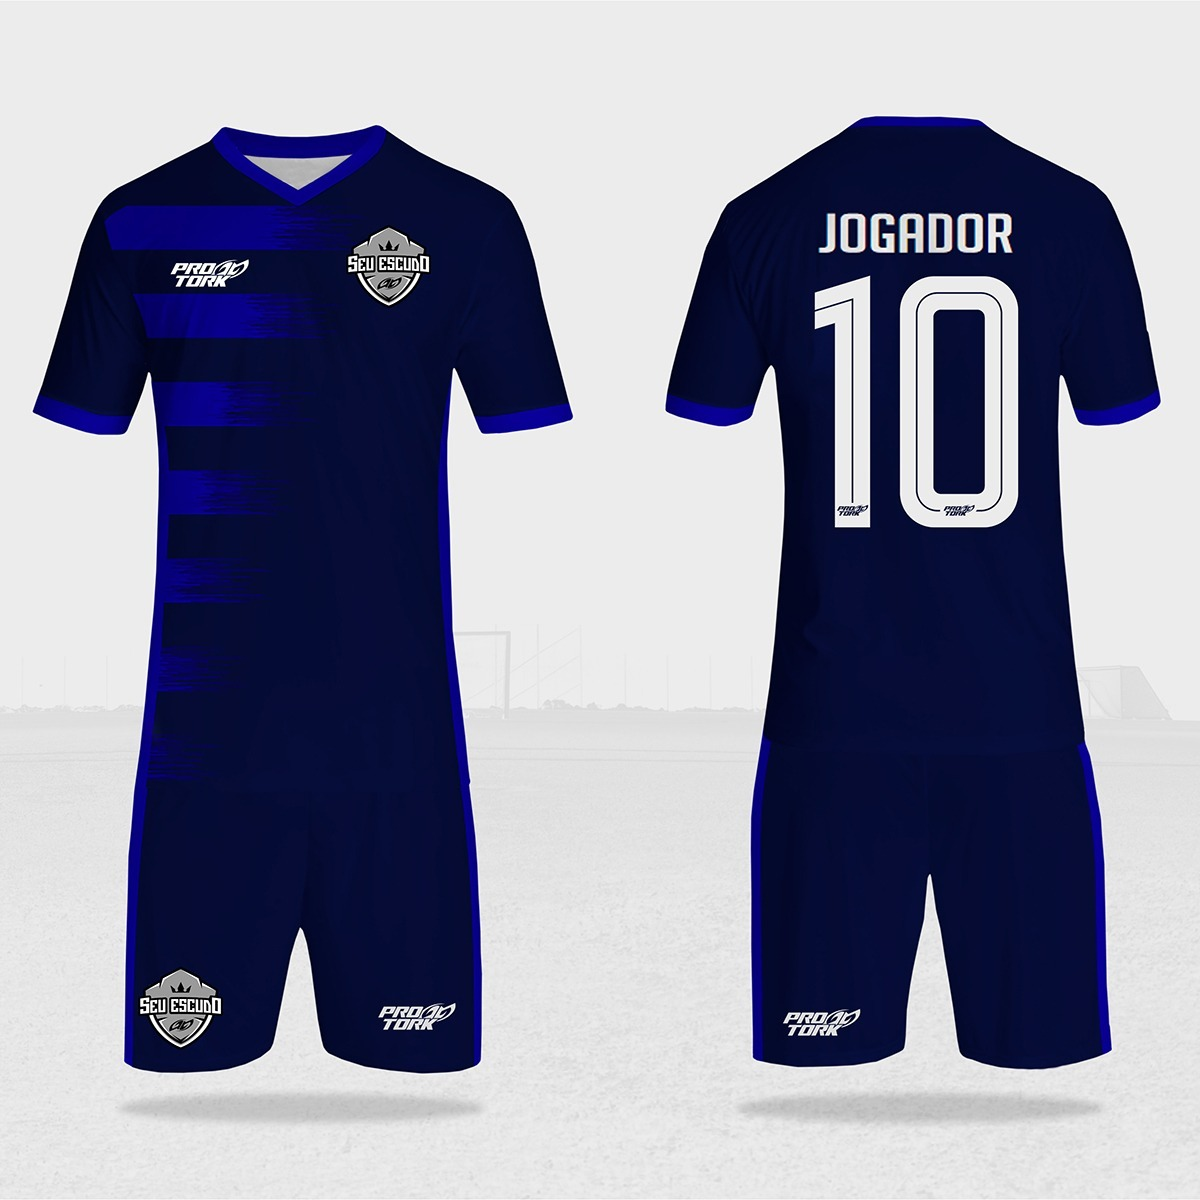 camisa de time personalizada futebol ou futsal. Carregando zoom. e770617f4551f